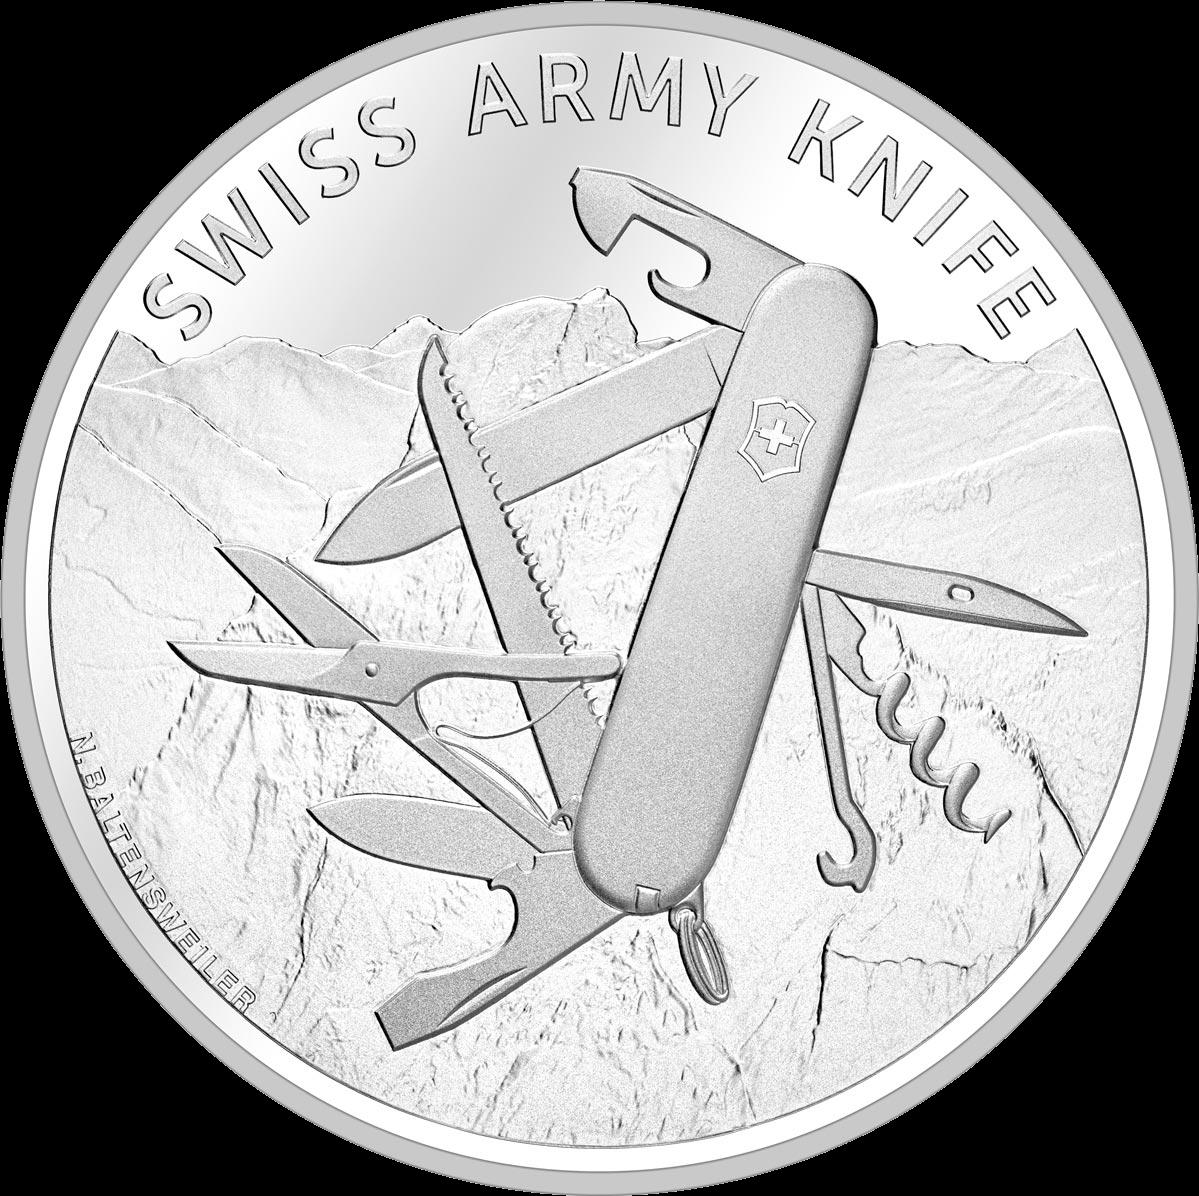 Швейцария монета 20 франков Швейцарский армейский нож, реверс